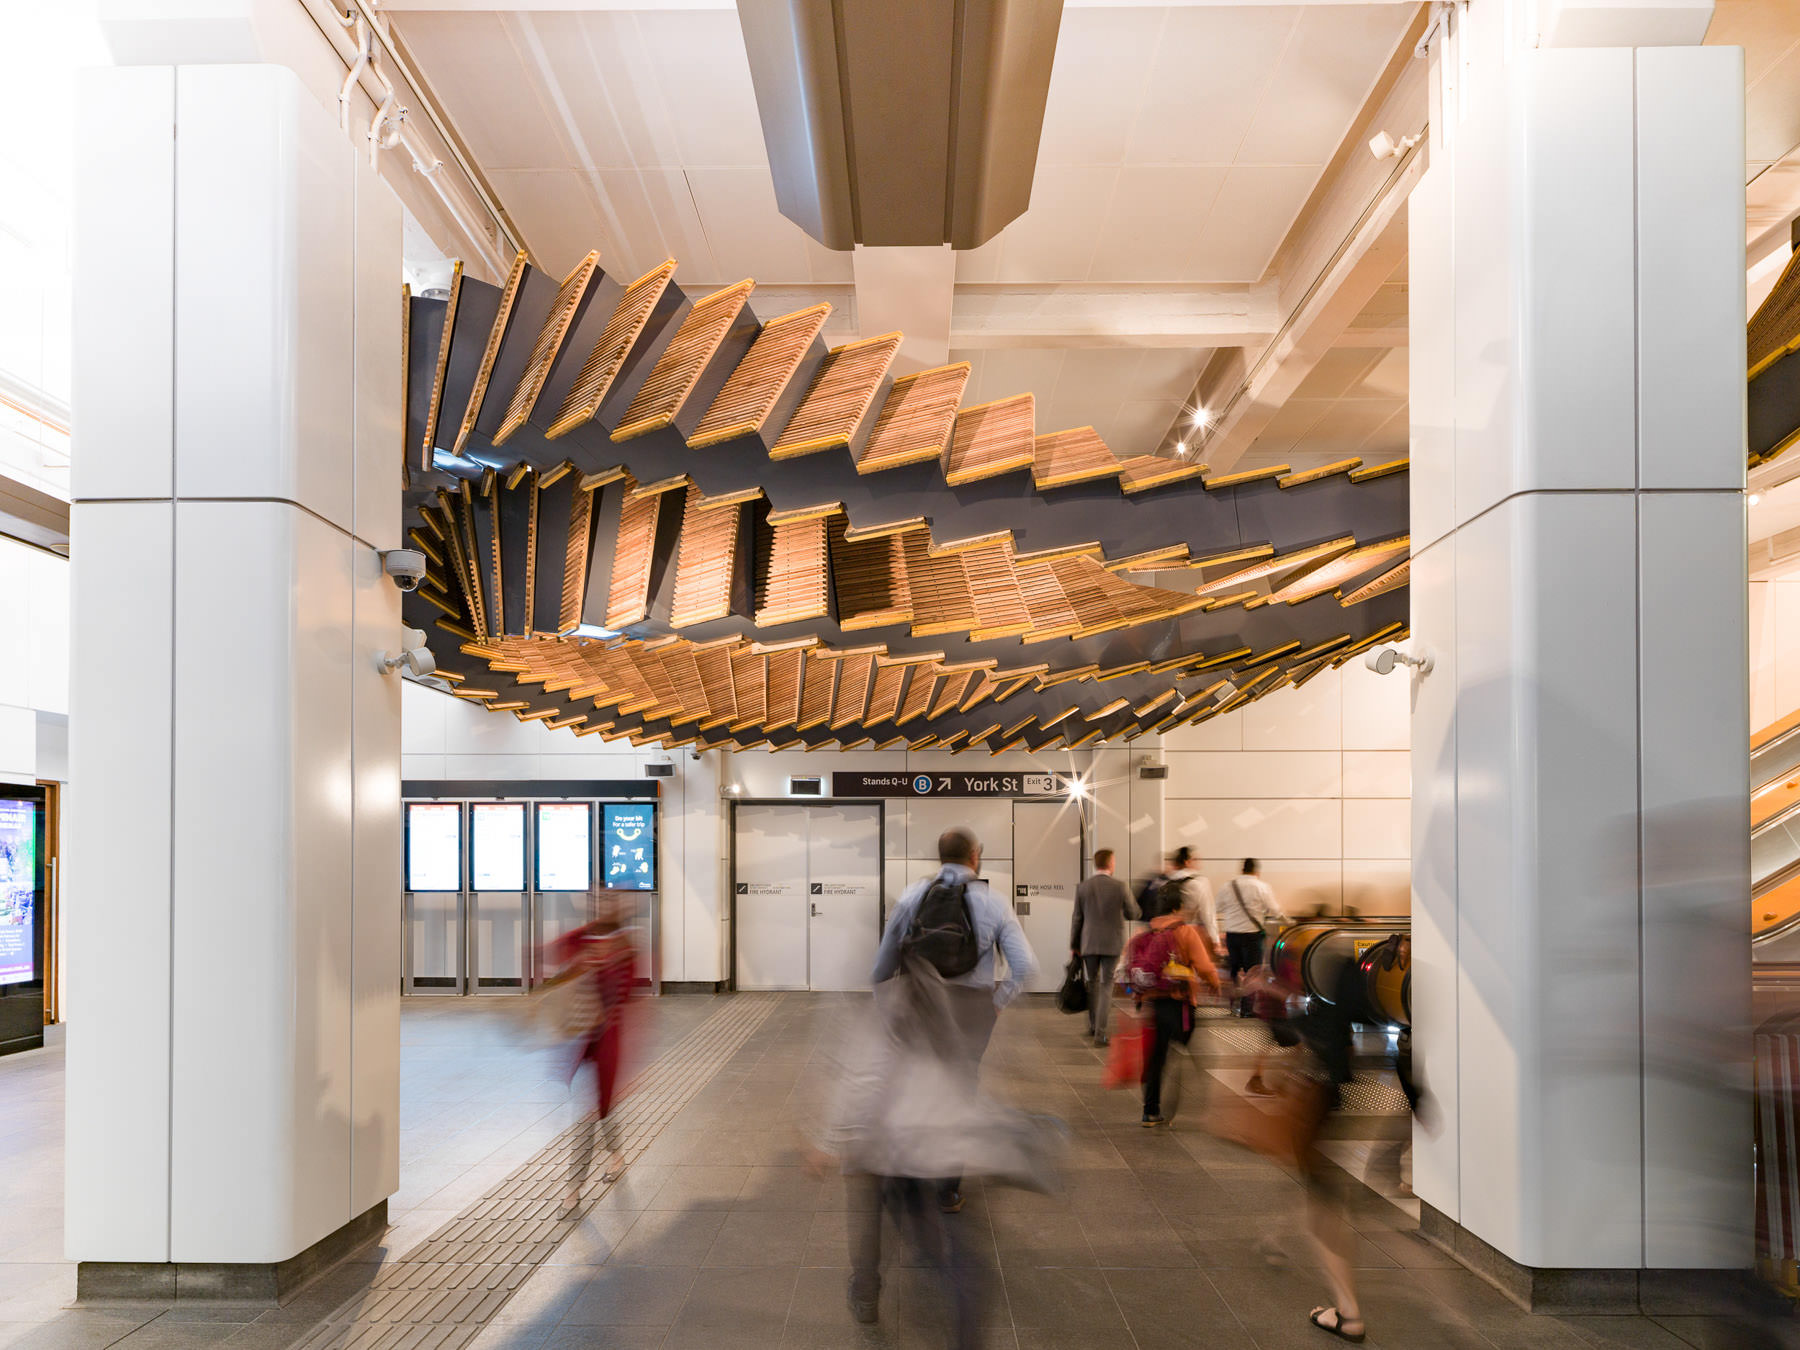 Sculptural Installation Made from Historic Wood Escalators in Sydney